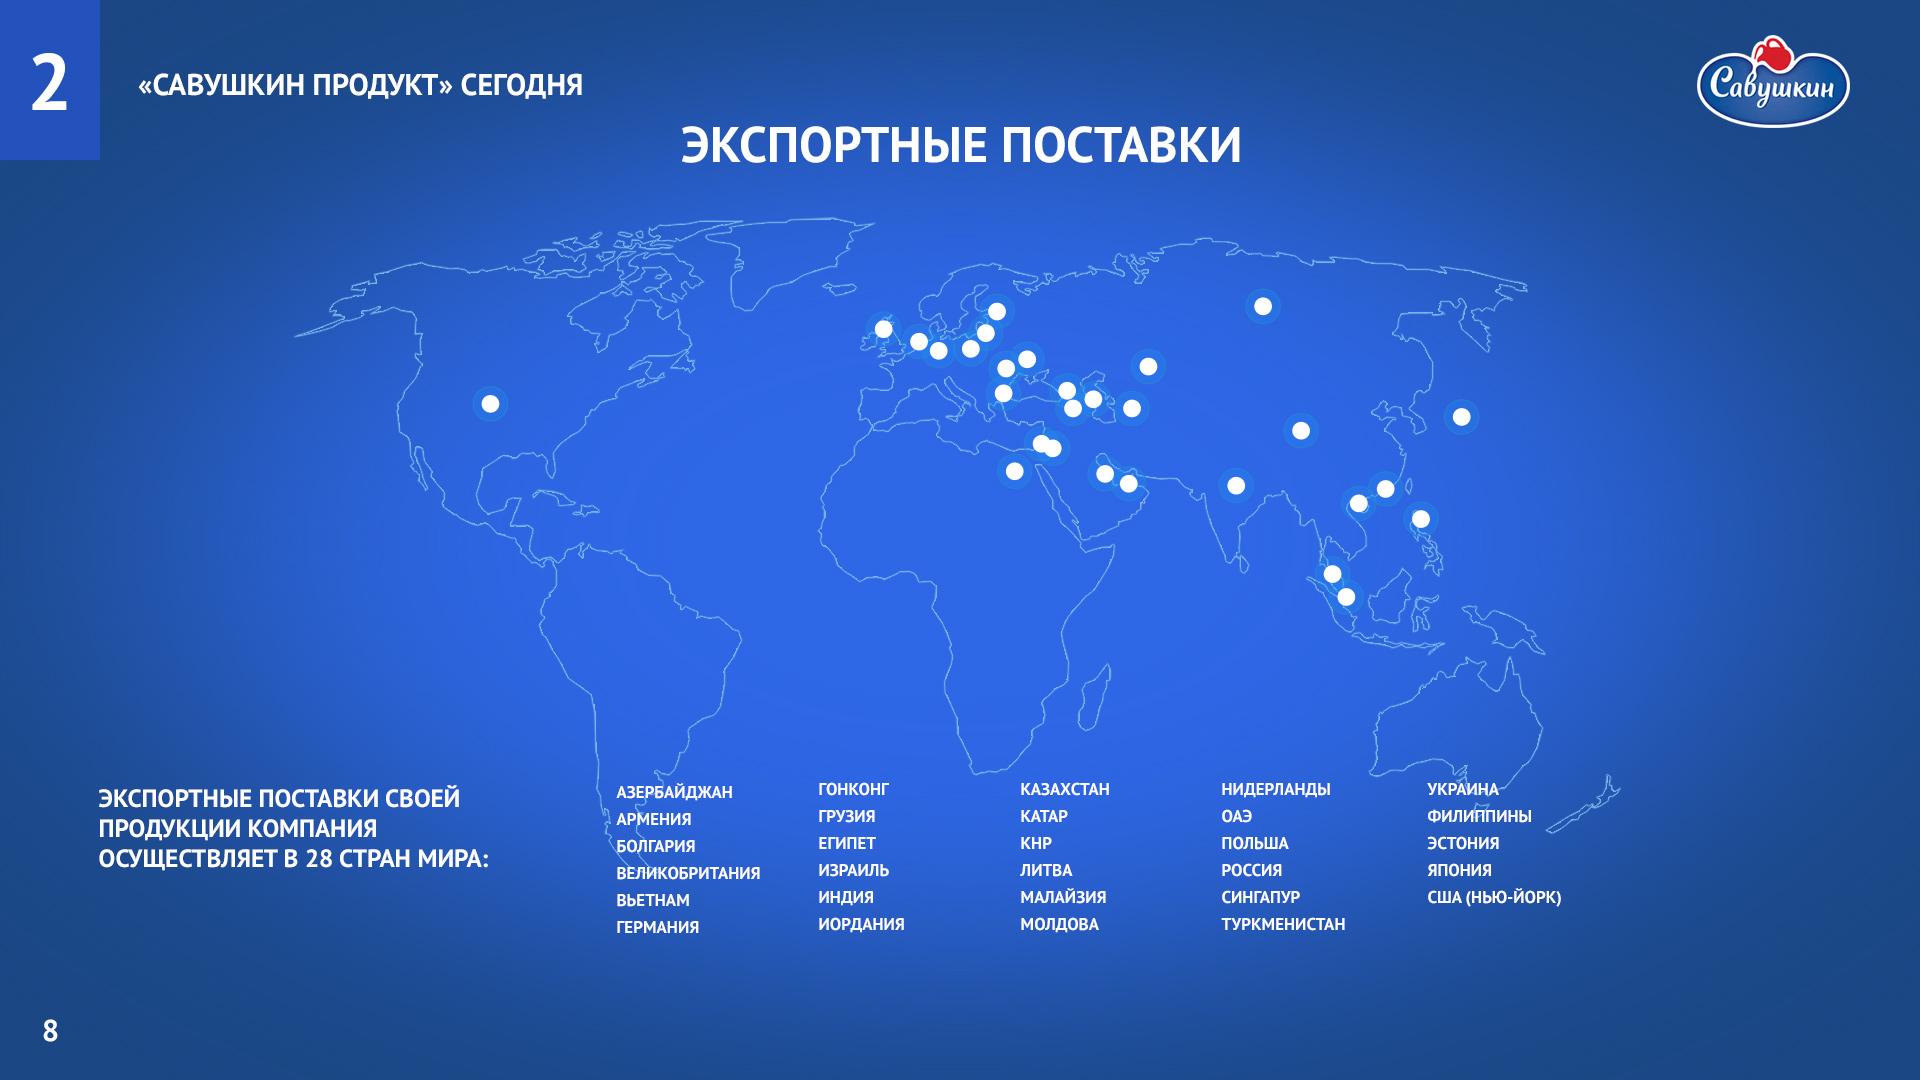 Savushkin_product_report-5